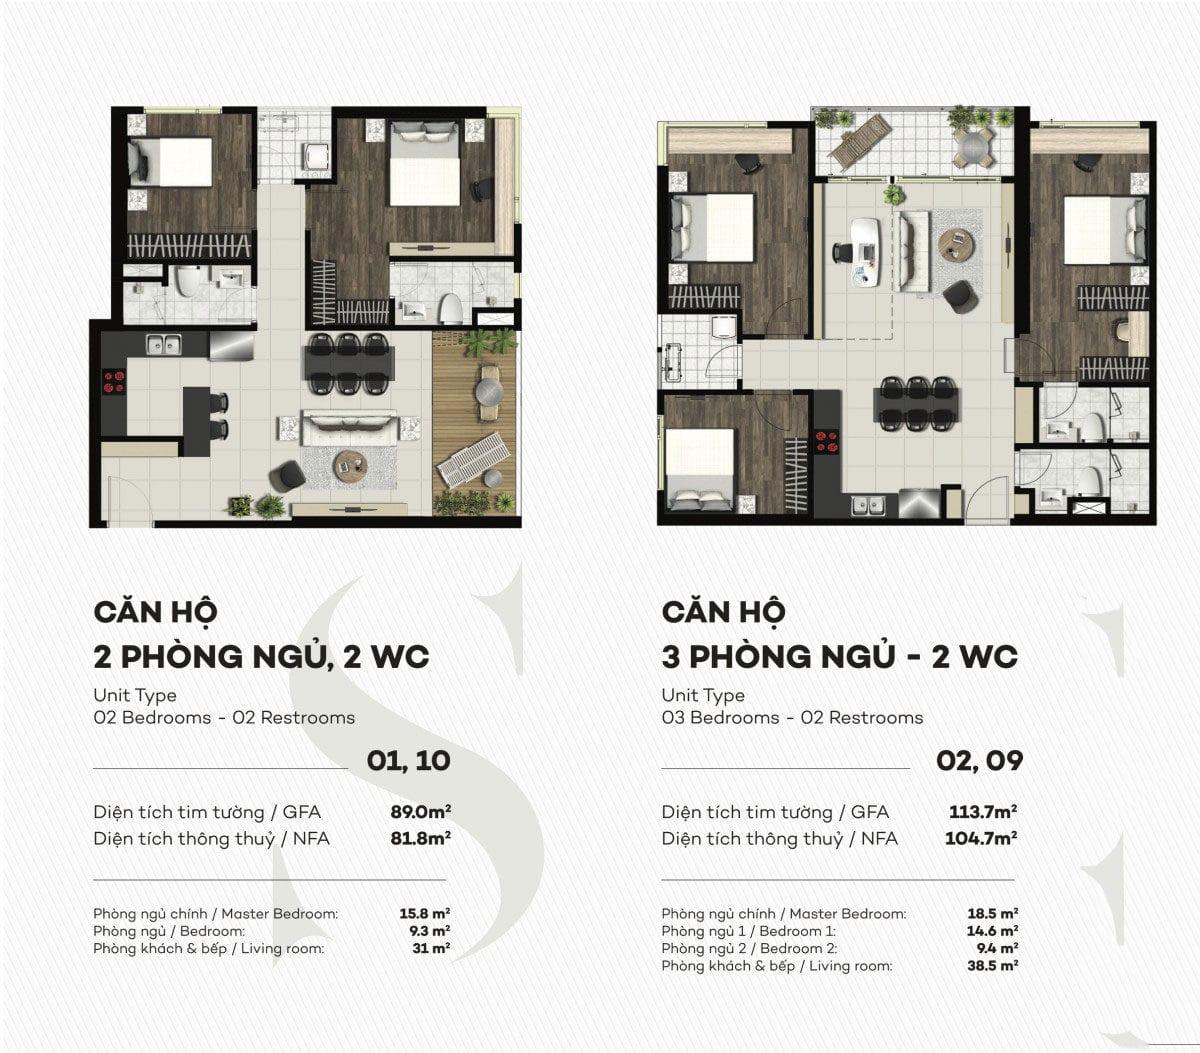 Thiết kế căn hộ 3 PN Smartel Signial Quận 7